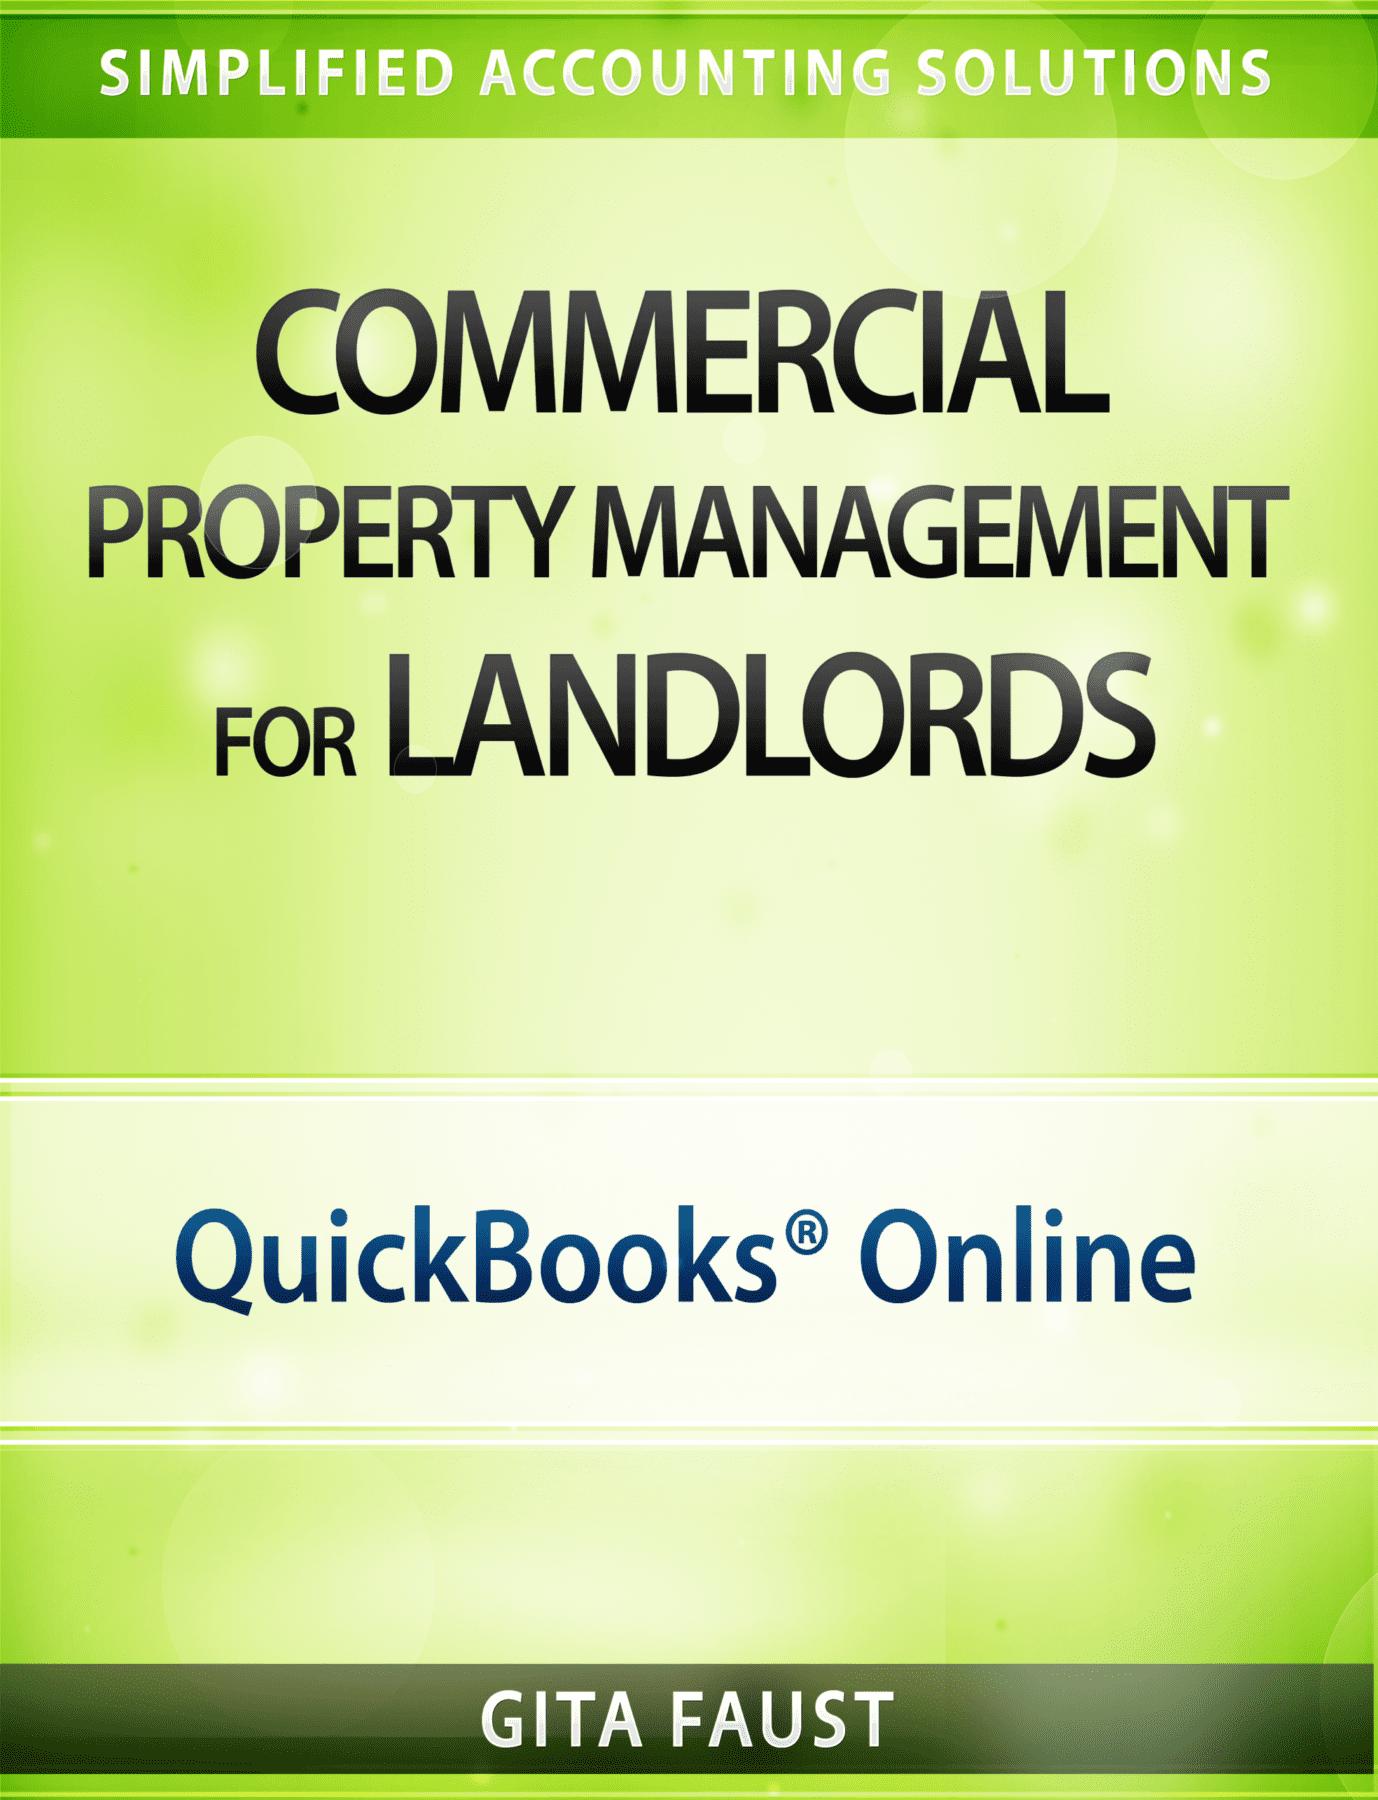 QuickBooks Online for Commercial Real Estate Investors Rentals